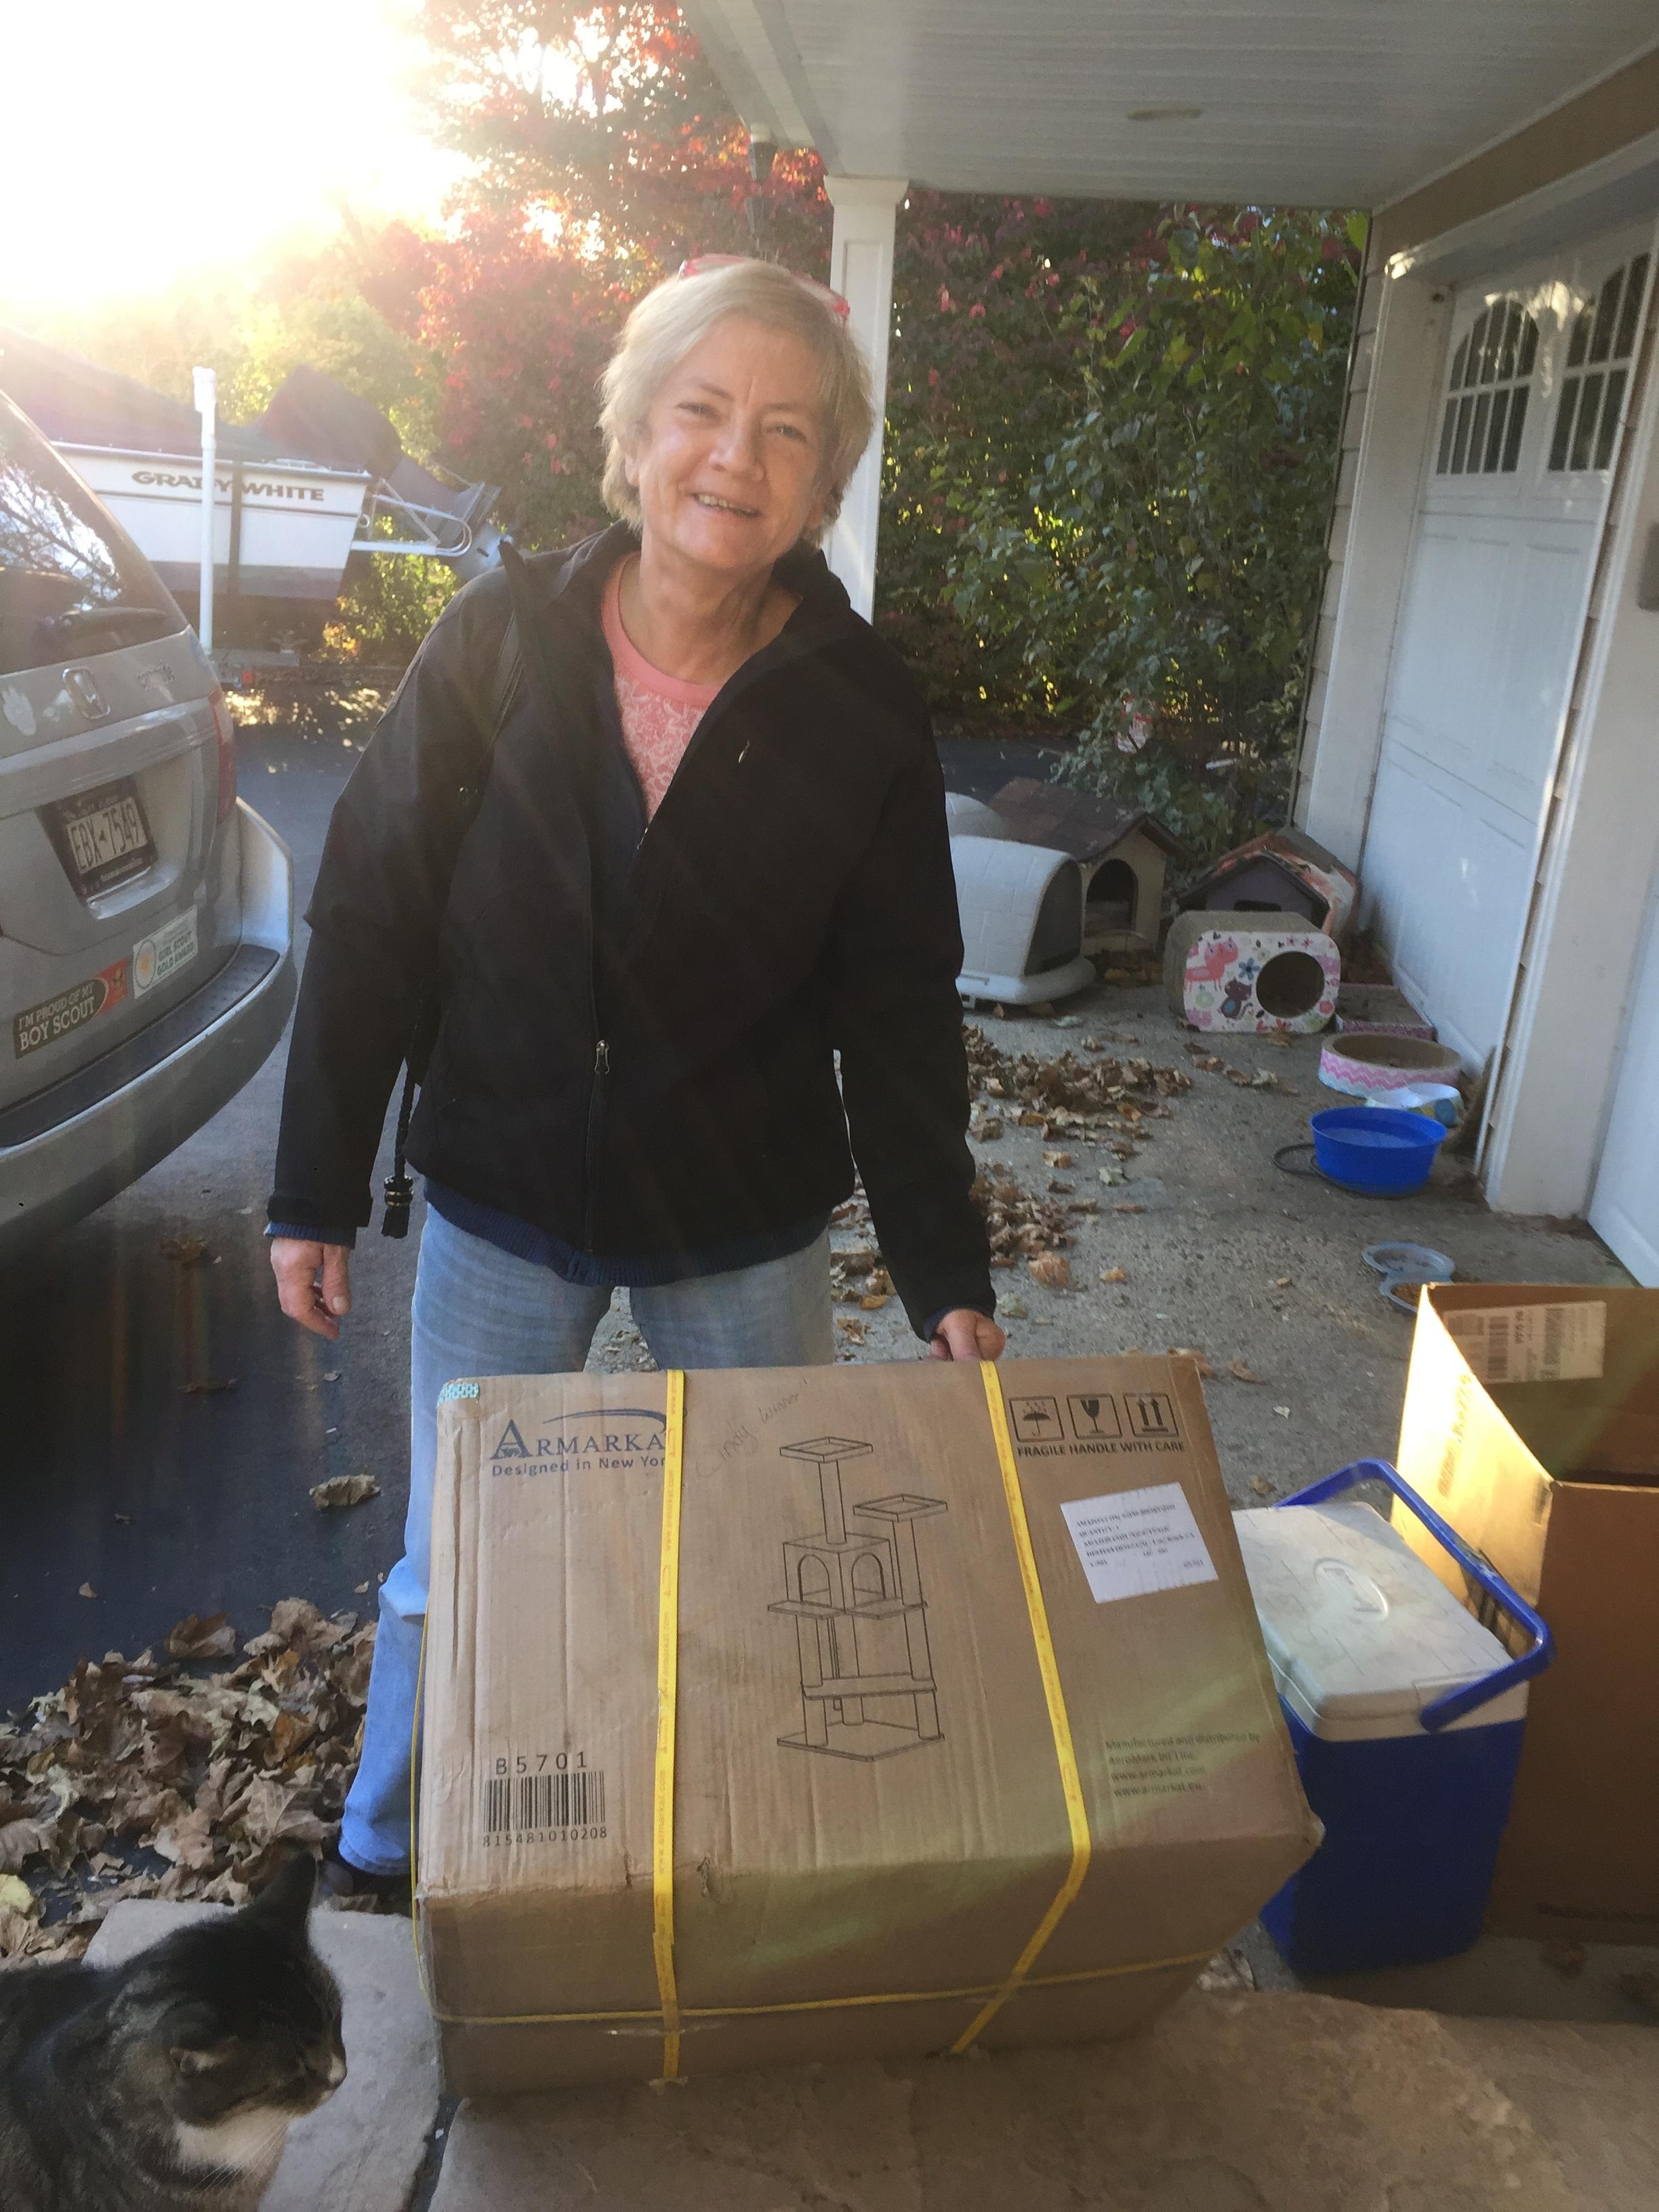 Cindy Balestrino won the cat tree! Congratulations!